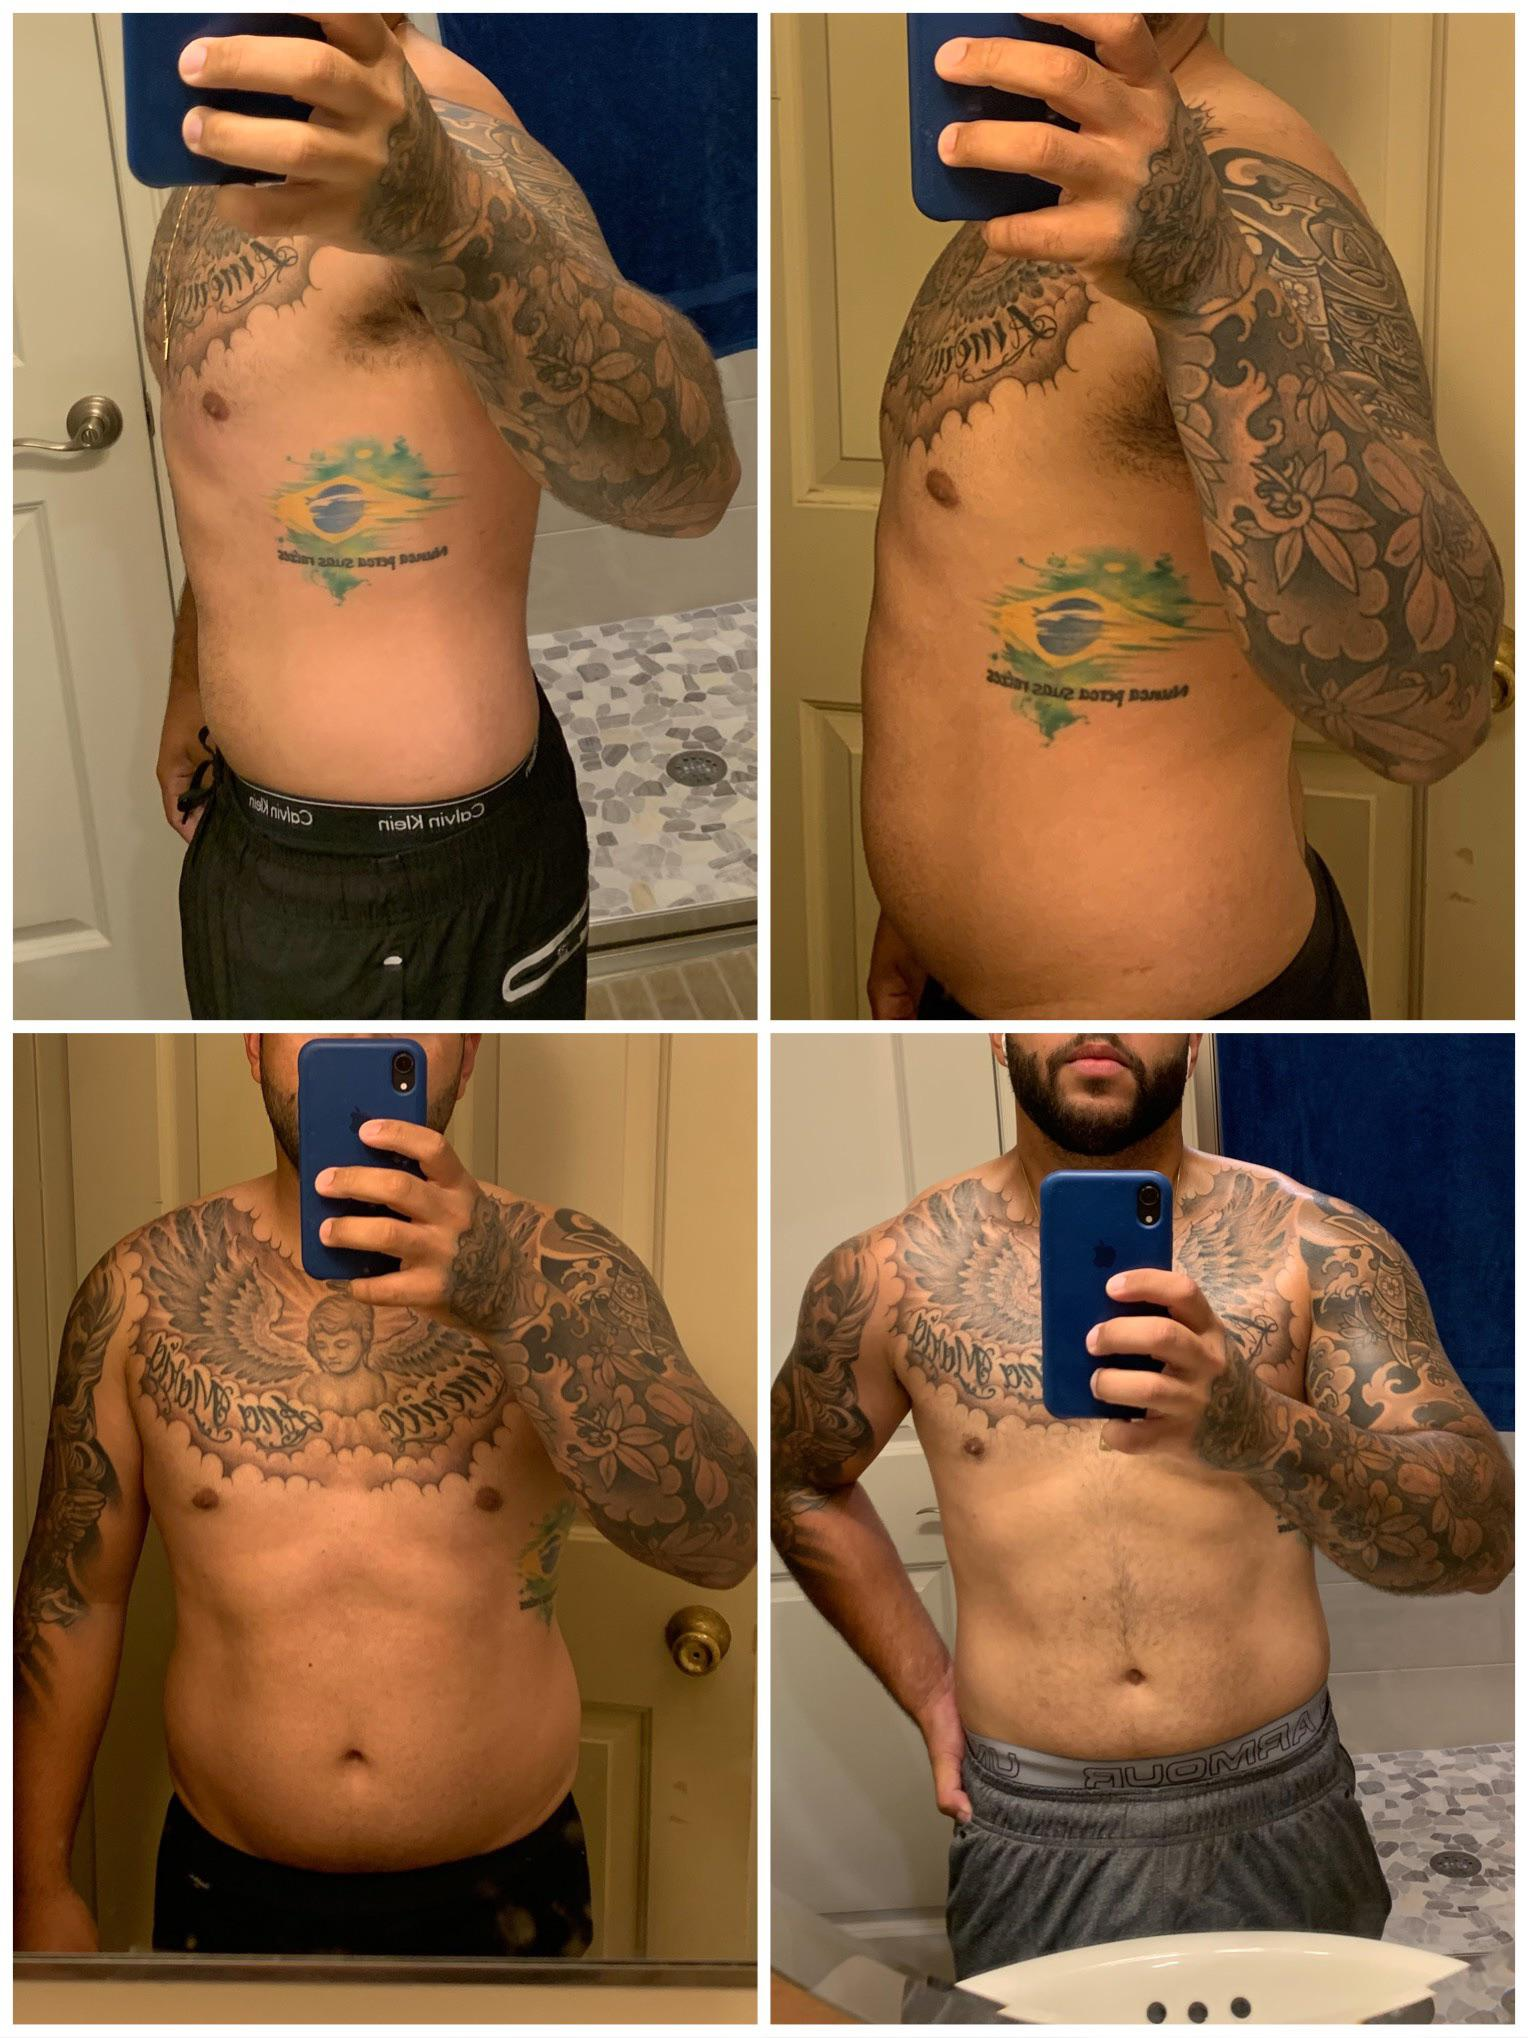 Progress Pics of 10 lbs Weight Loss 5 feet 7 Male 192 lbs to 182 lbs